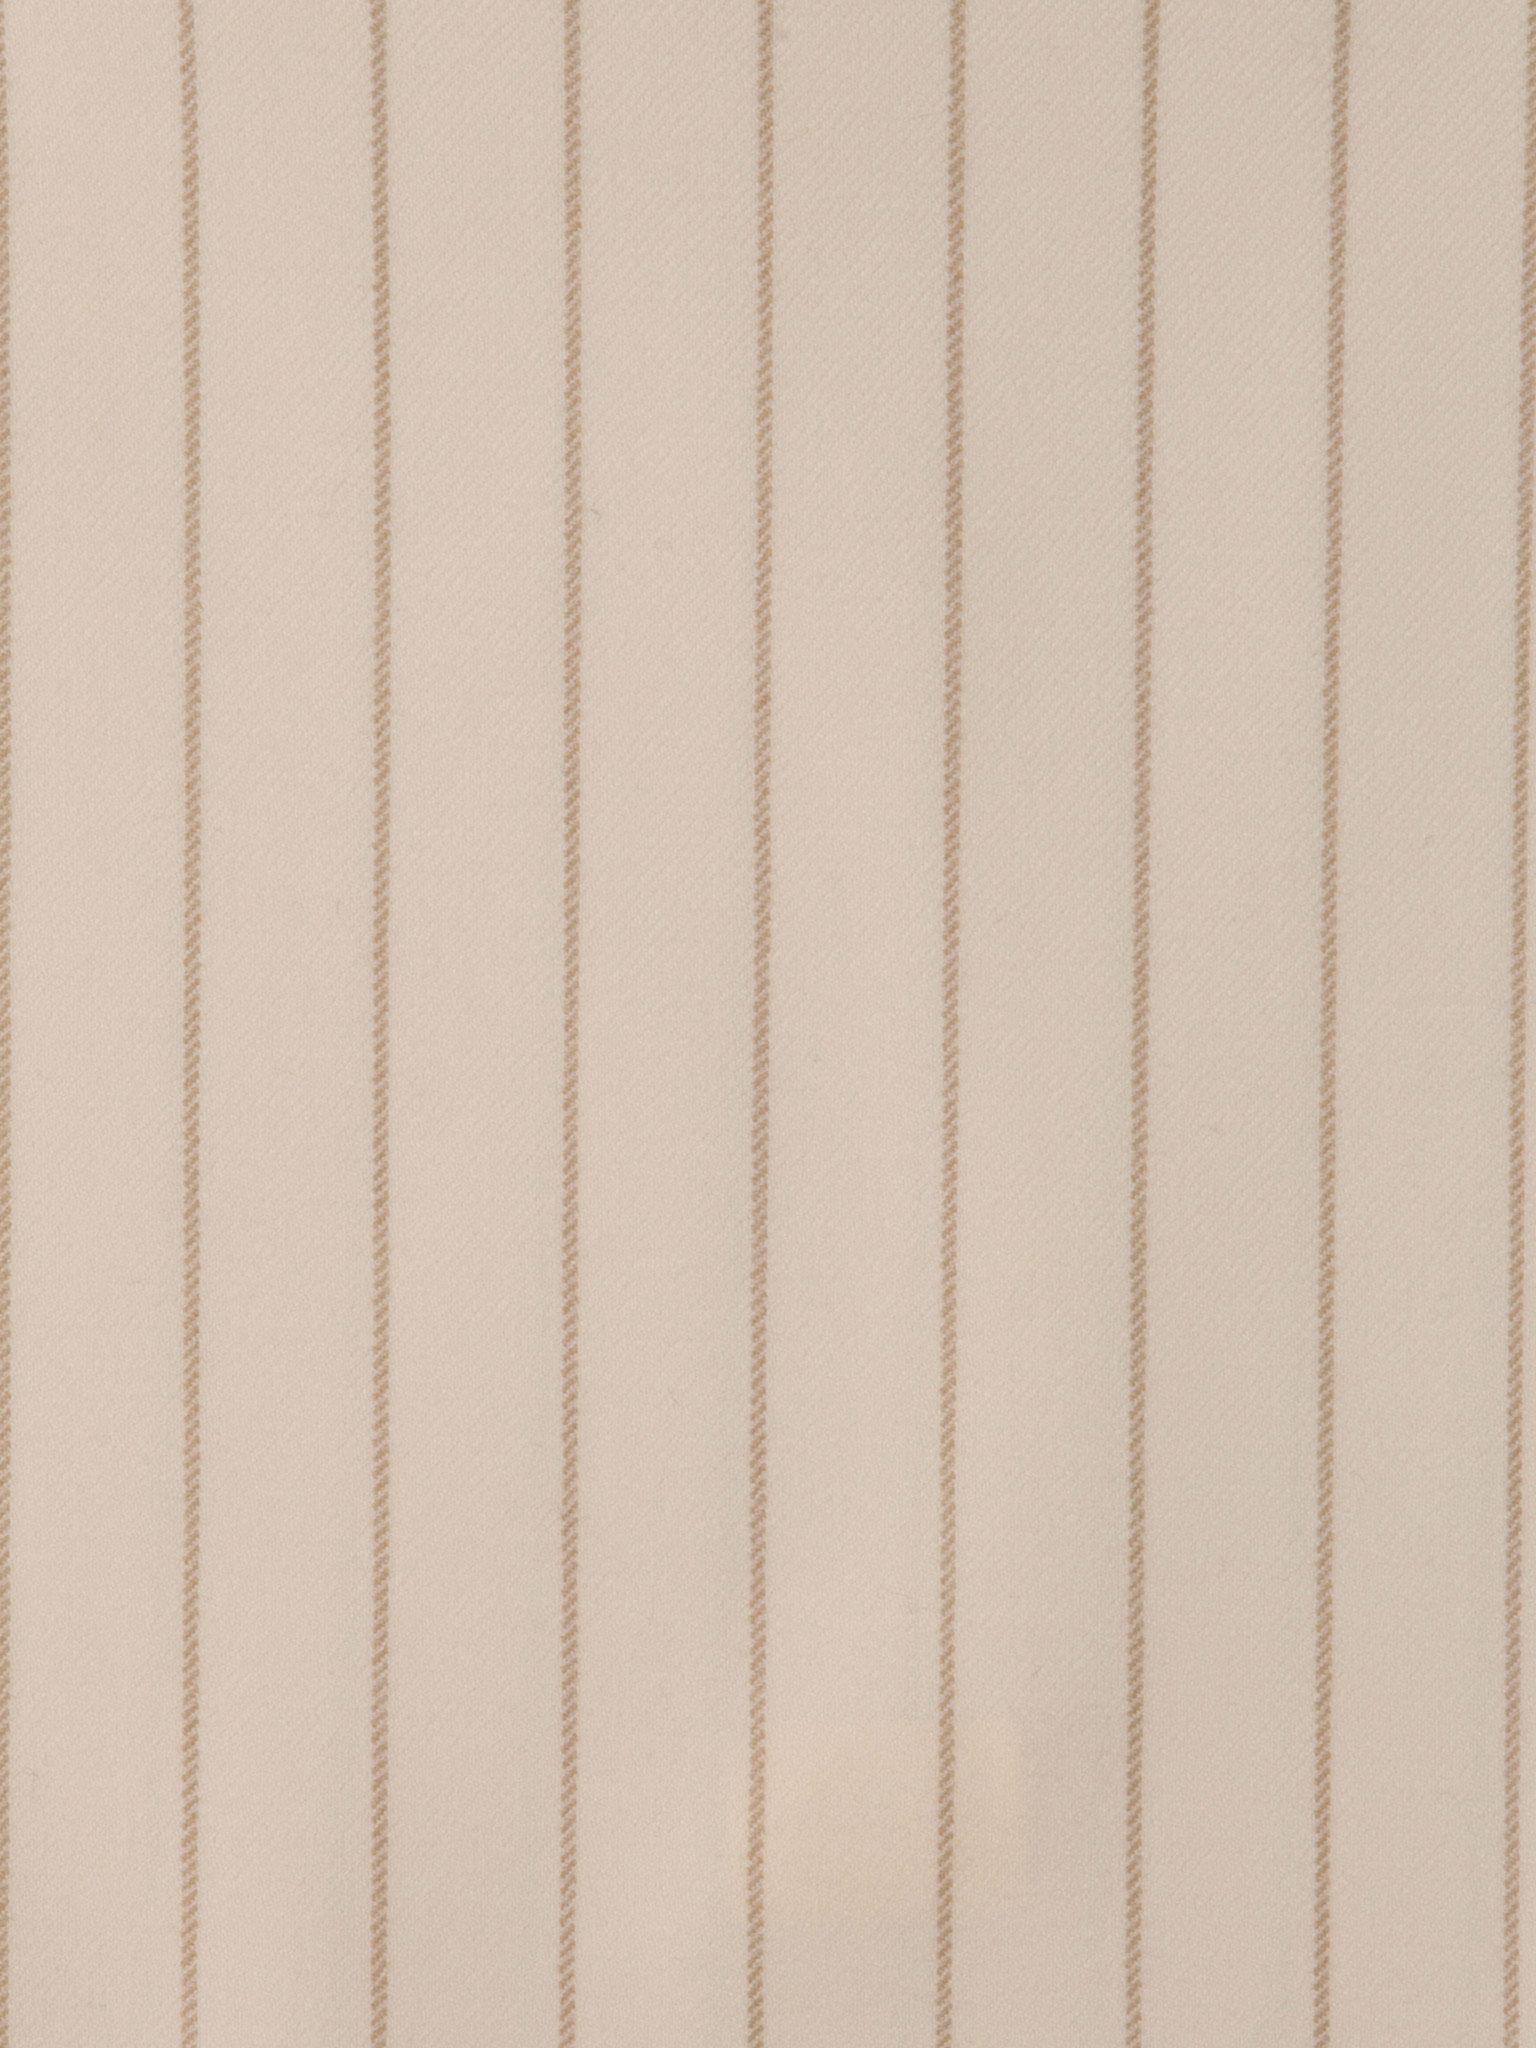 SAVILE ROW CHALK STRIPE DE12065